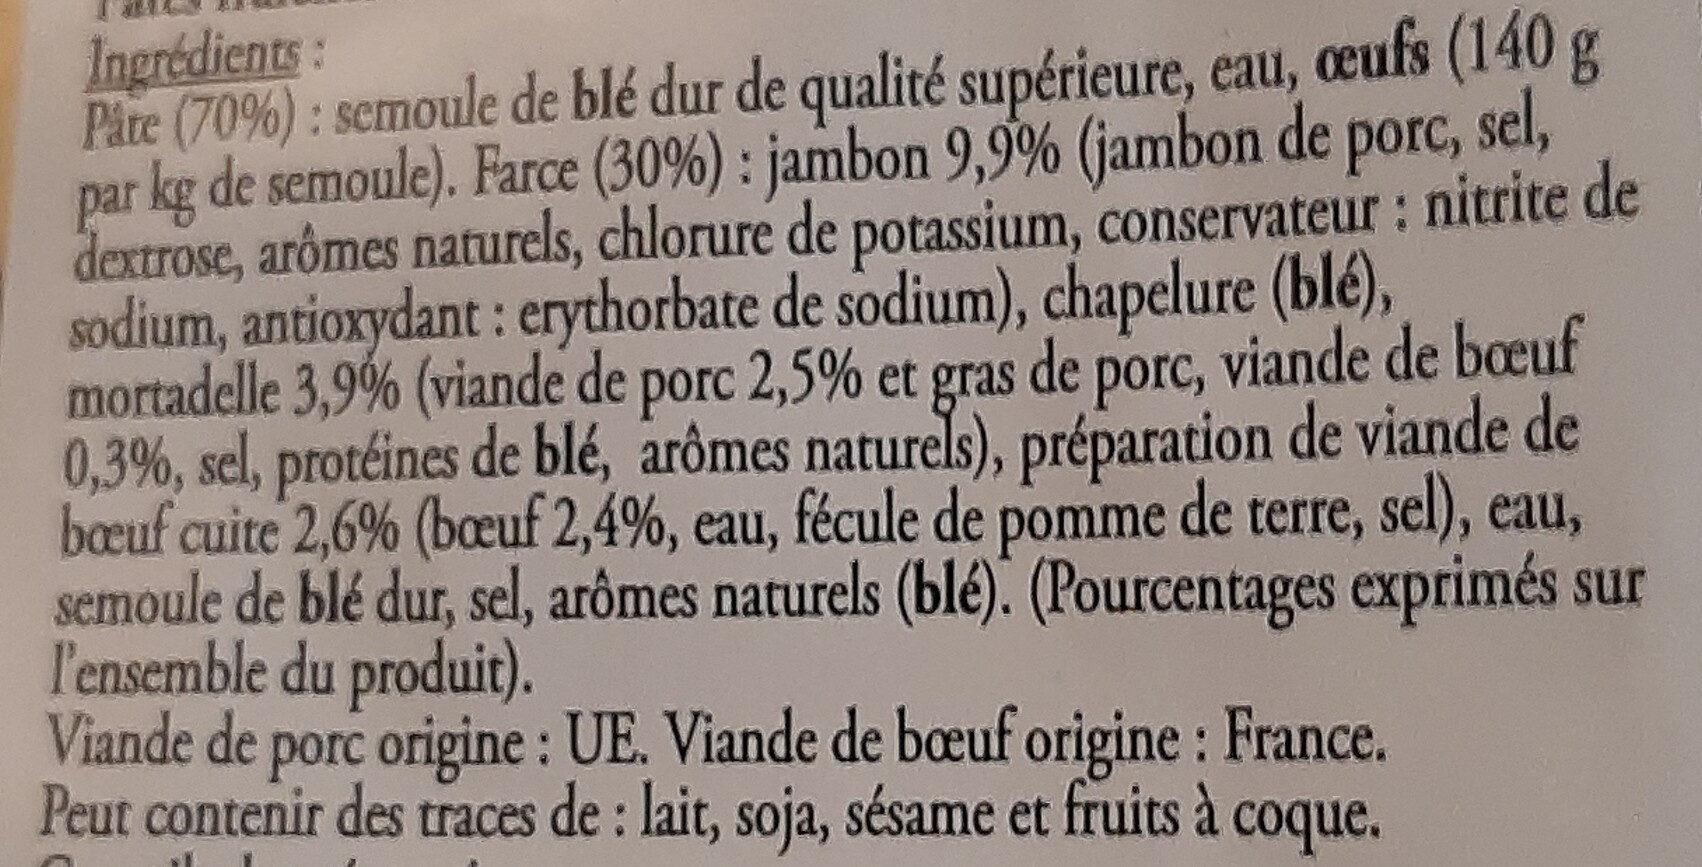 Ravioli à la viande - Ingrédients - fr